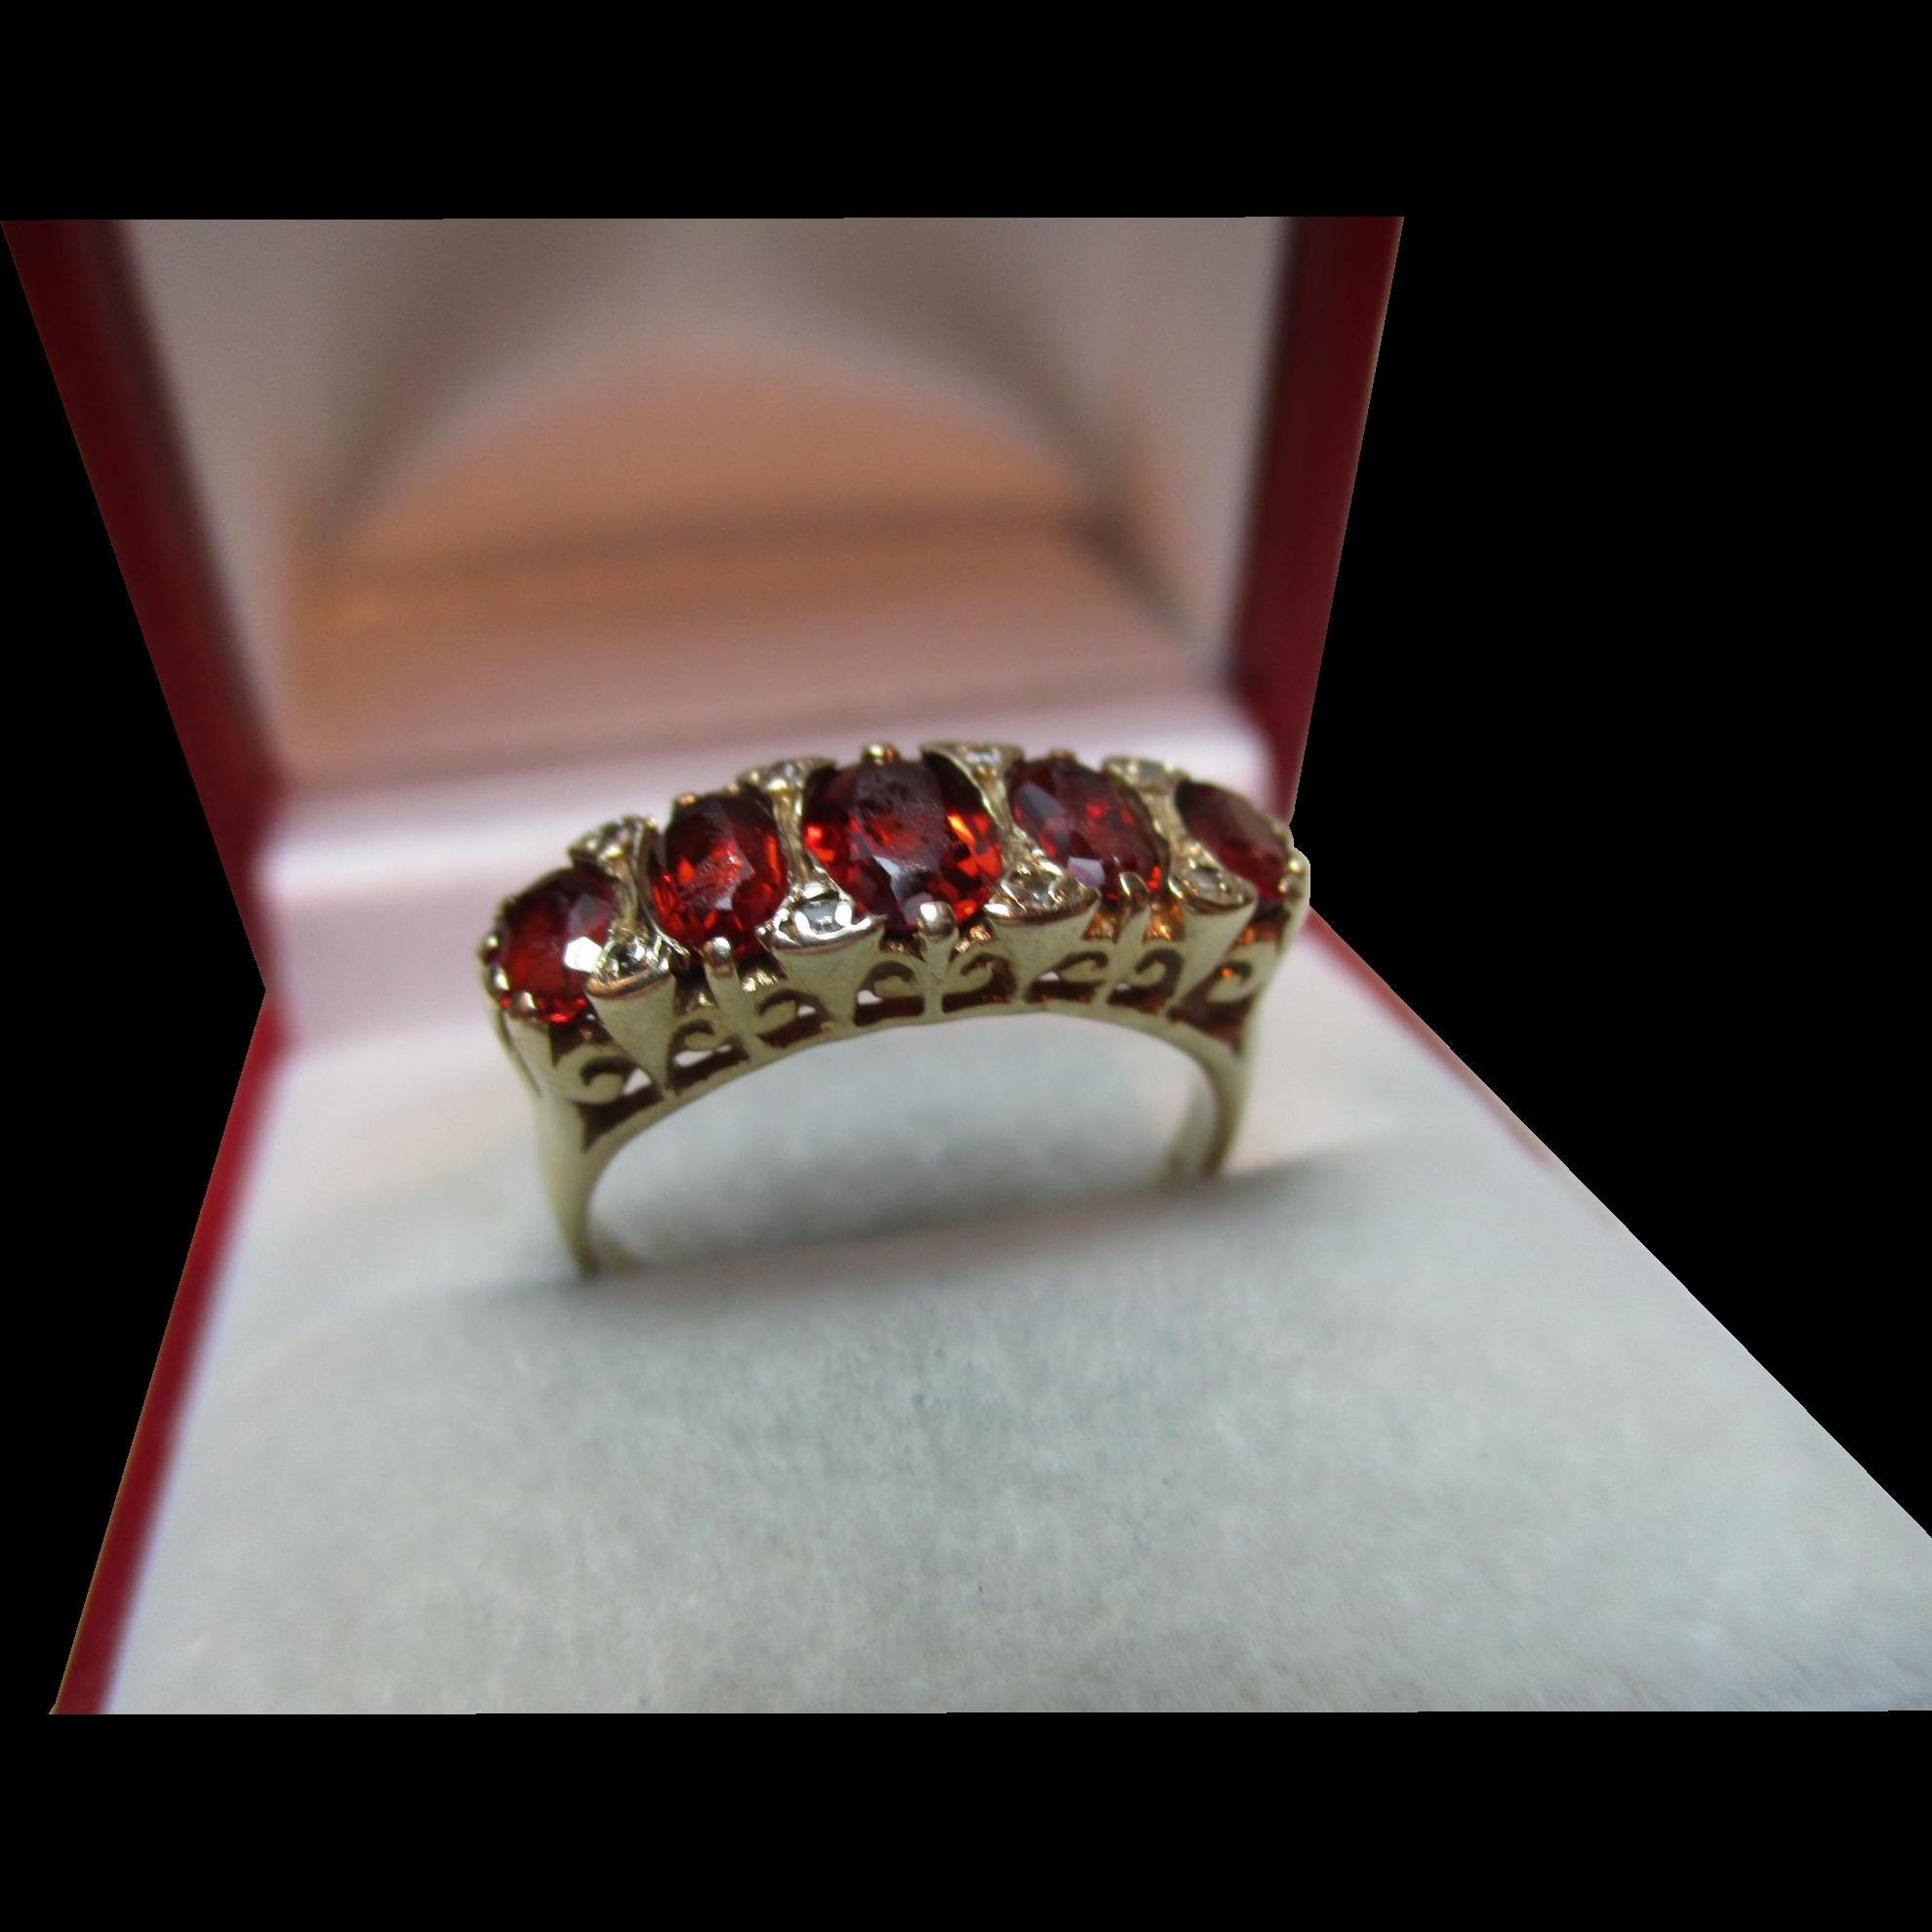 Attractive Vintage{London 1990} 9ct Solid Gold Diamond + Garnet Gemstone Ring